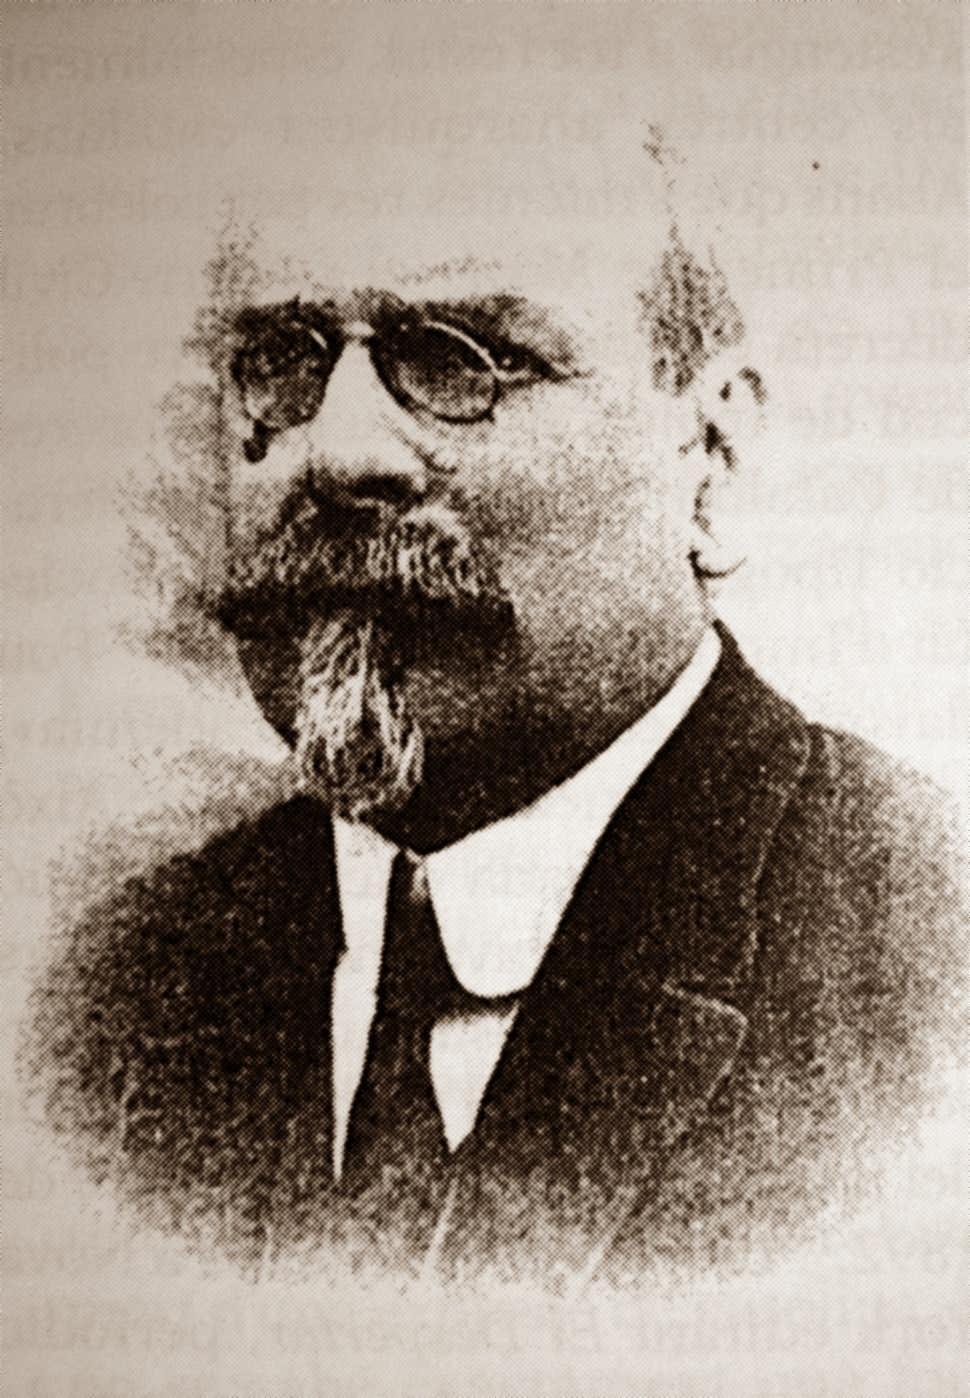 Pere Esteve